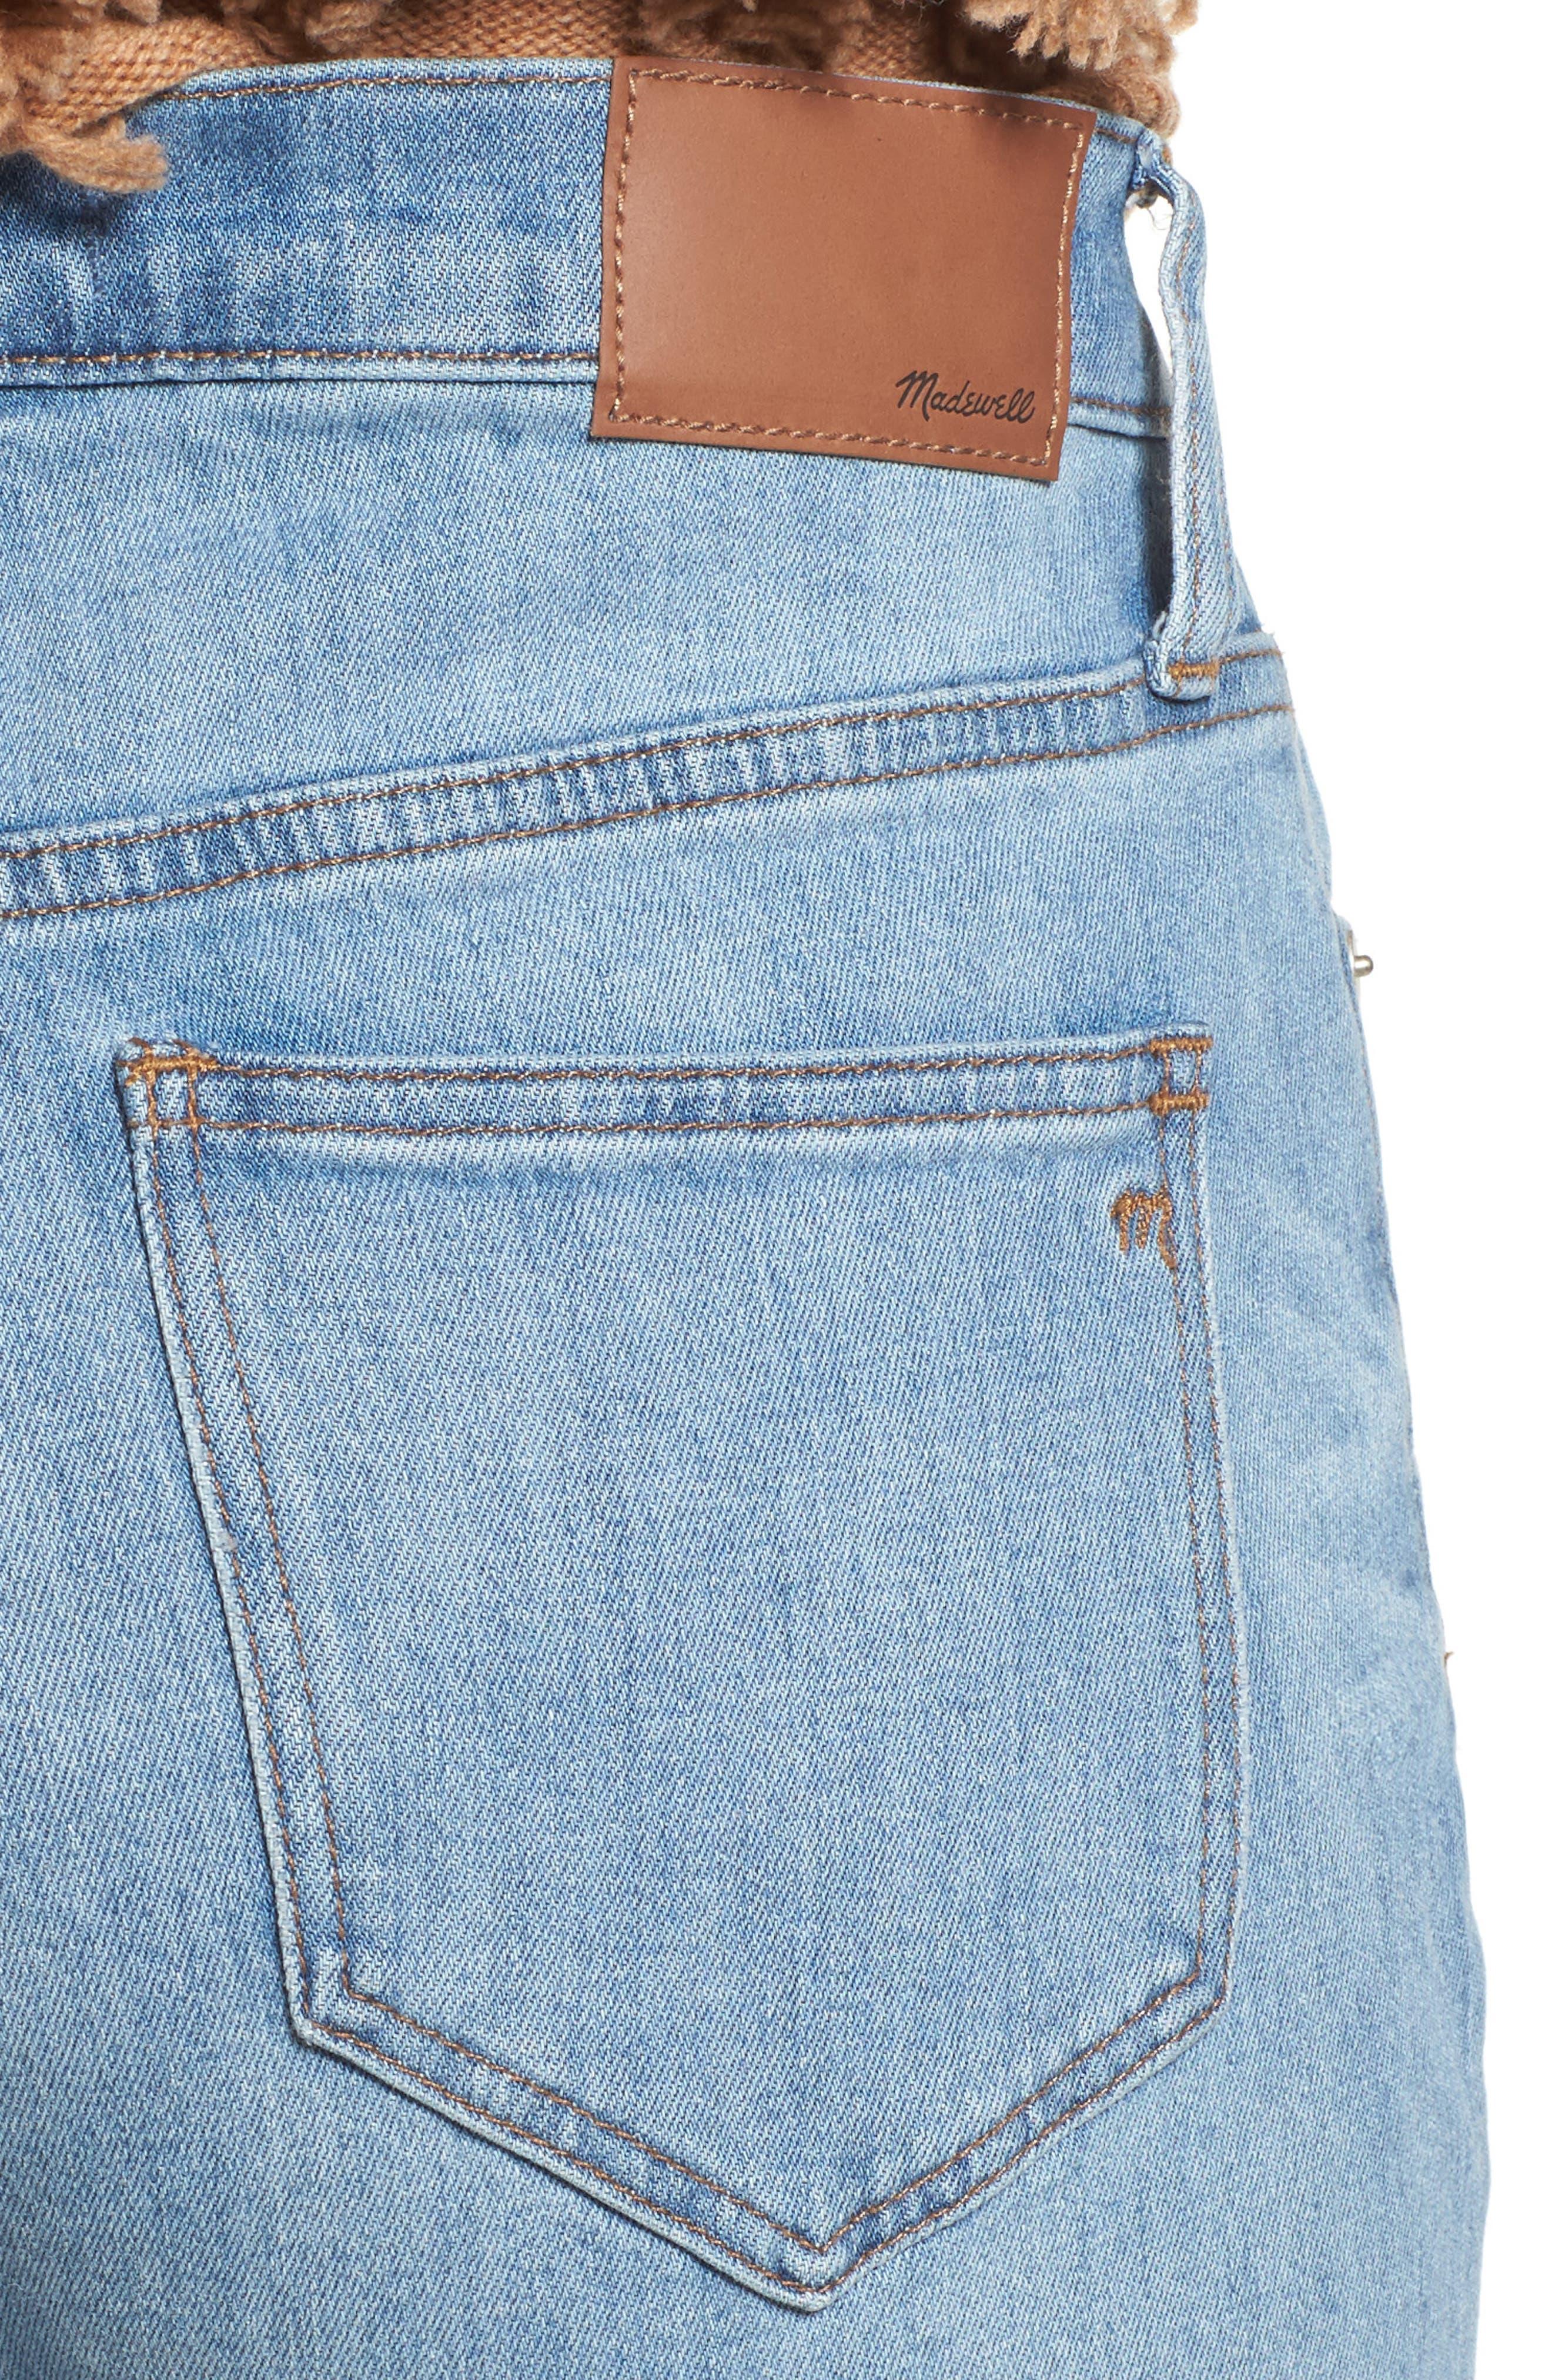 Cruiser Pieced High Waist Straight Leg Jeans,                             Alternate thumbnail 4, color,                             400